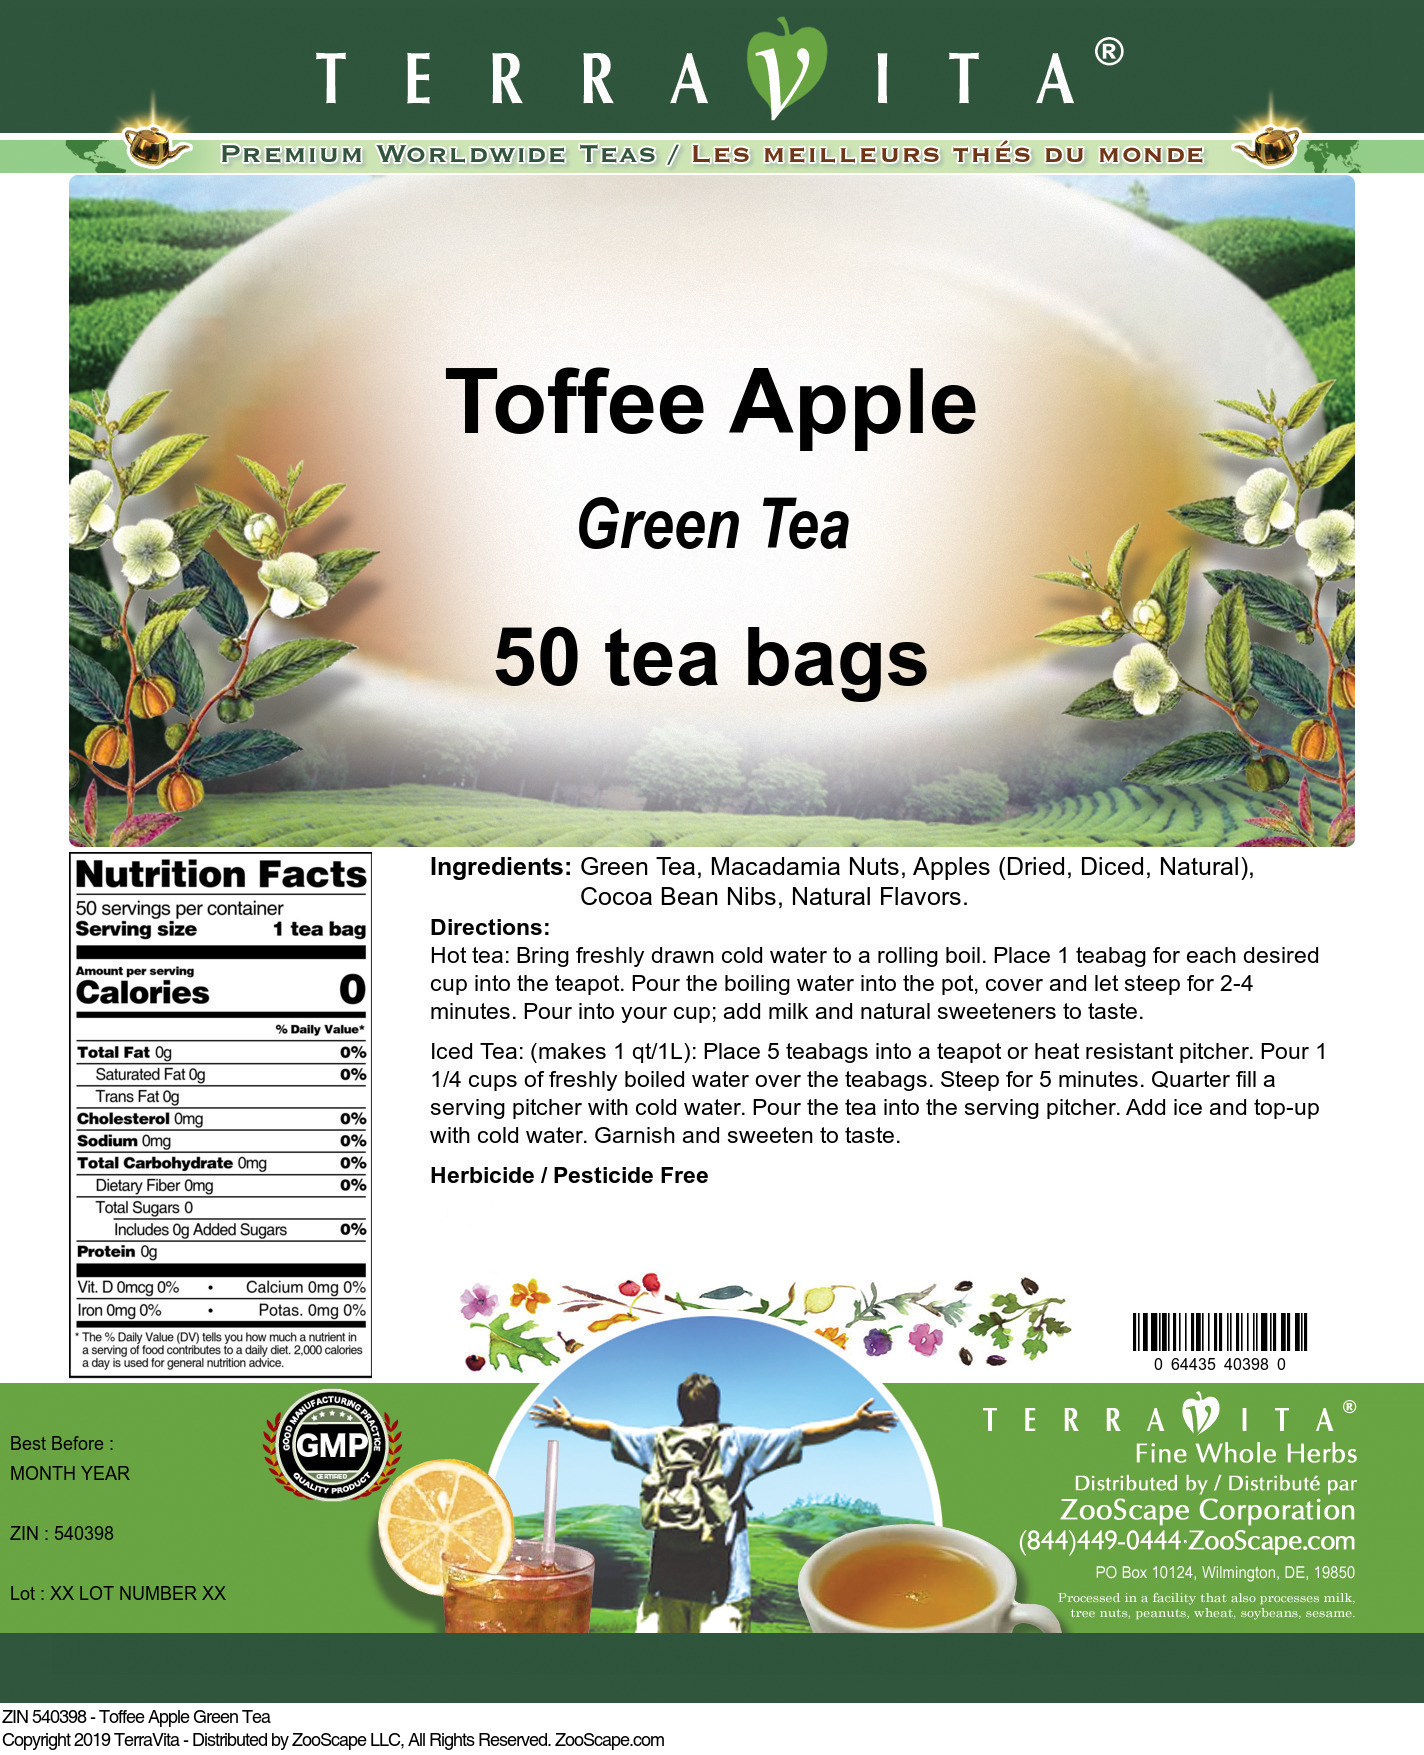 Toffee Apple Green Tea